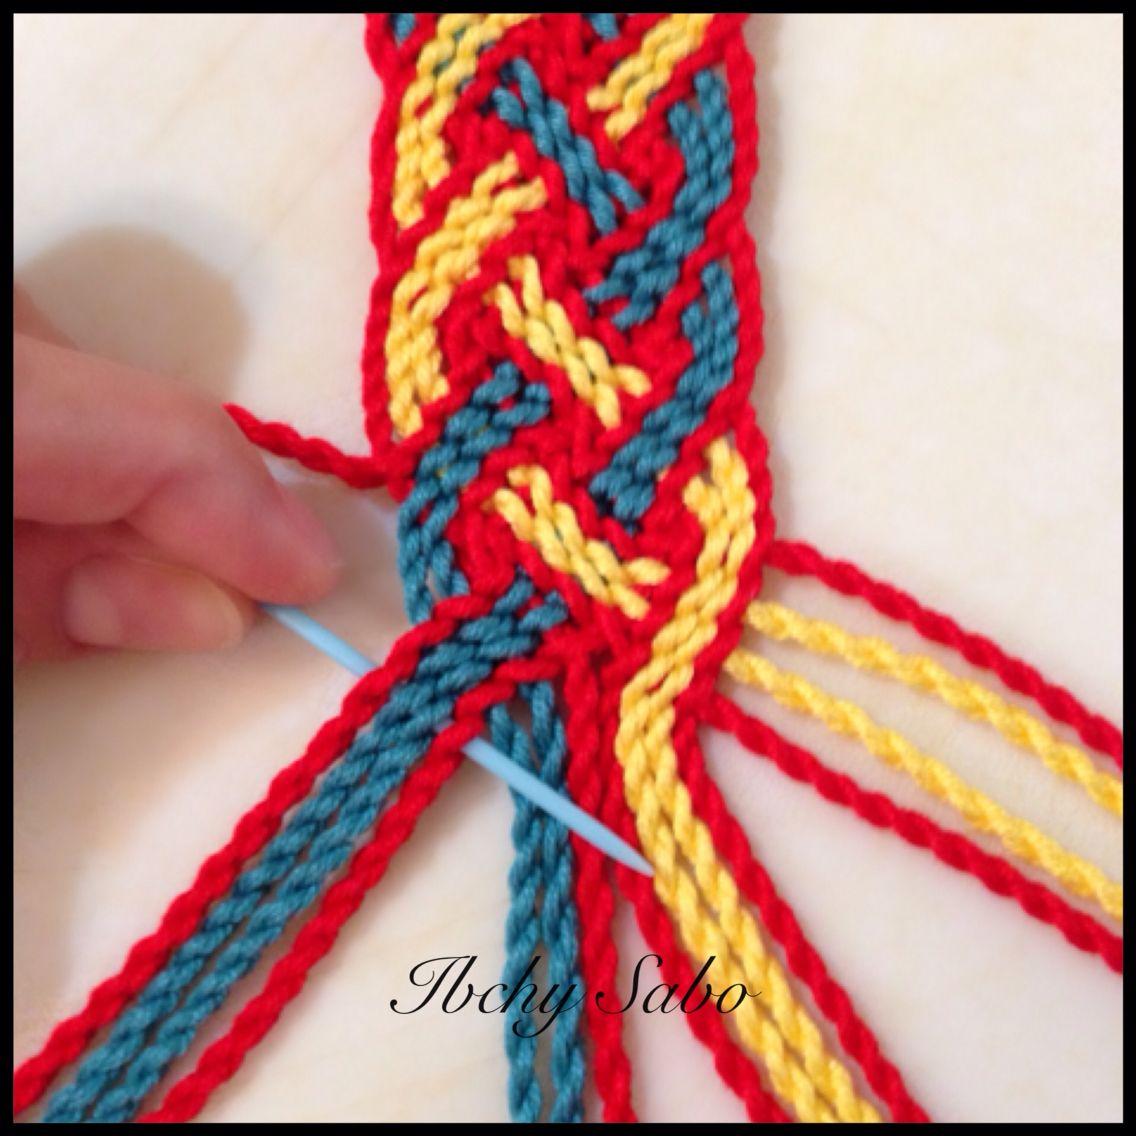 Strap weaving